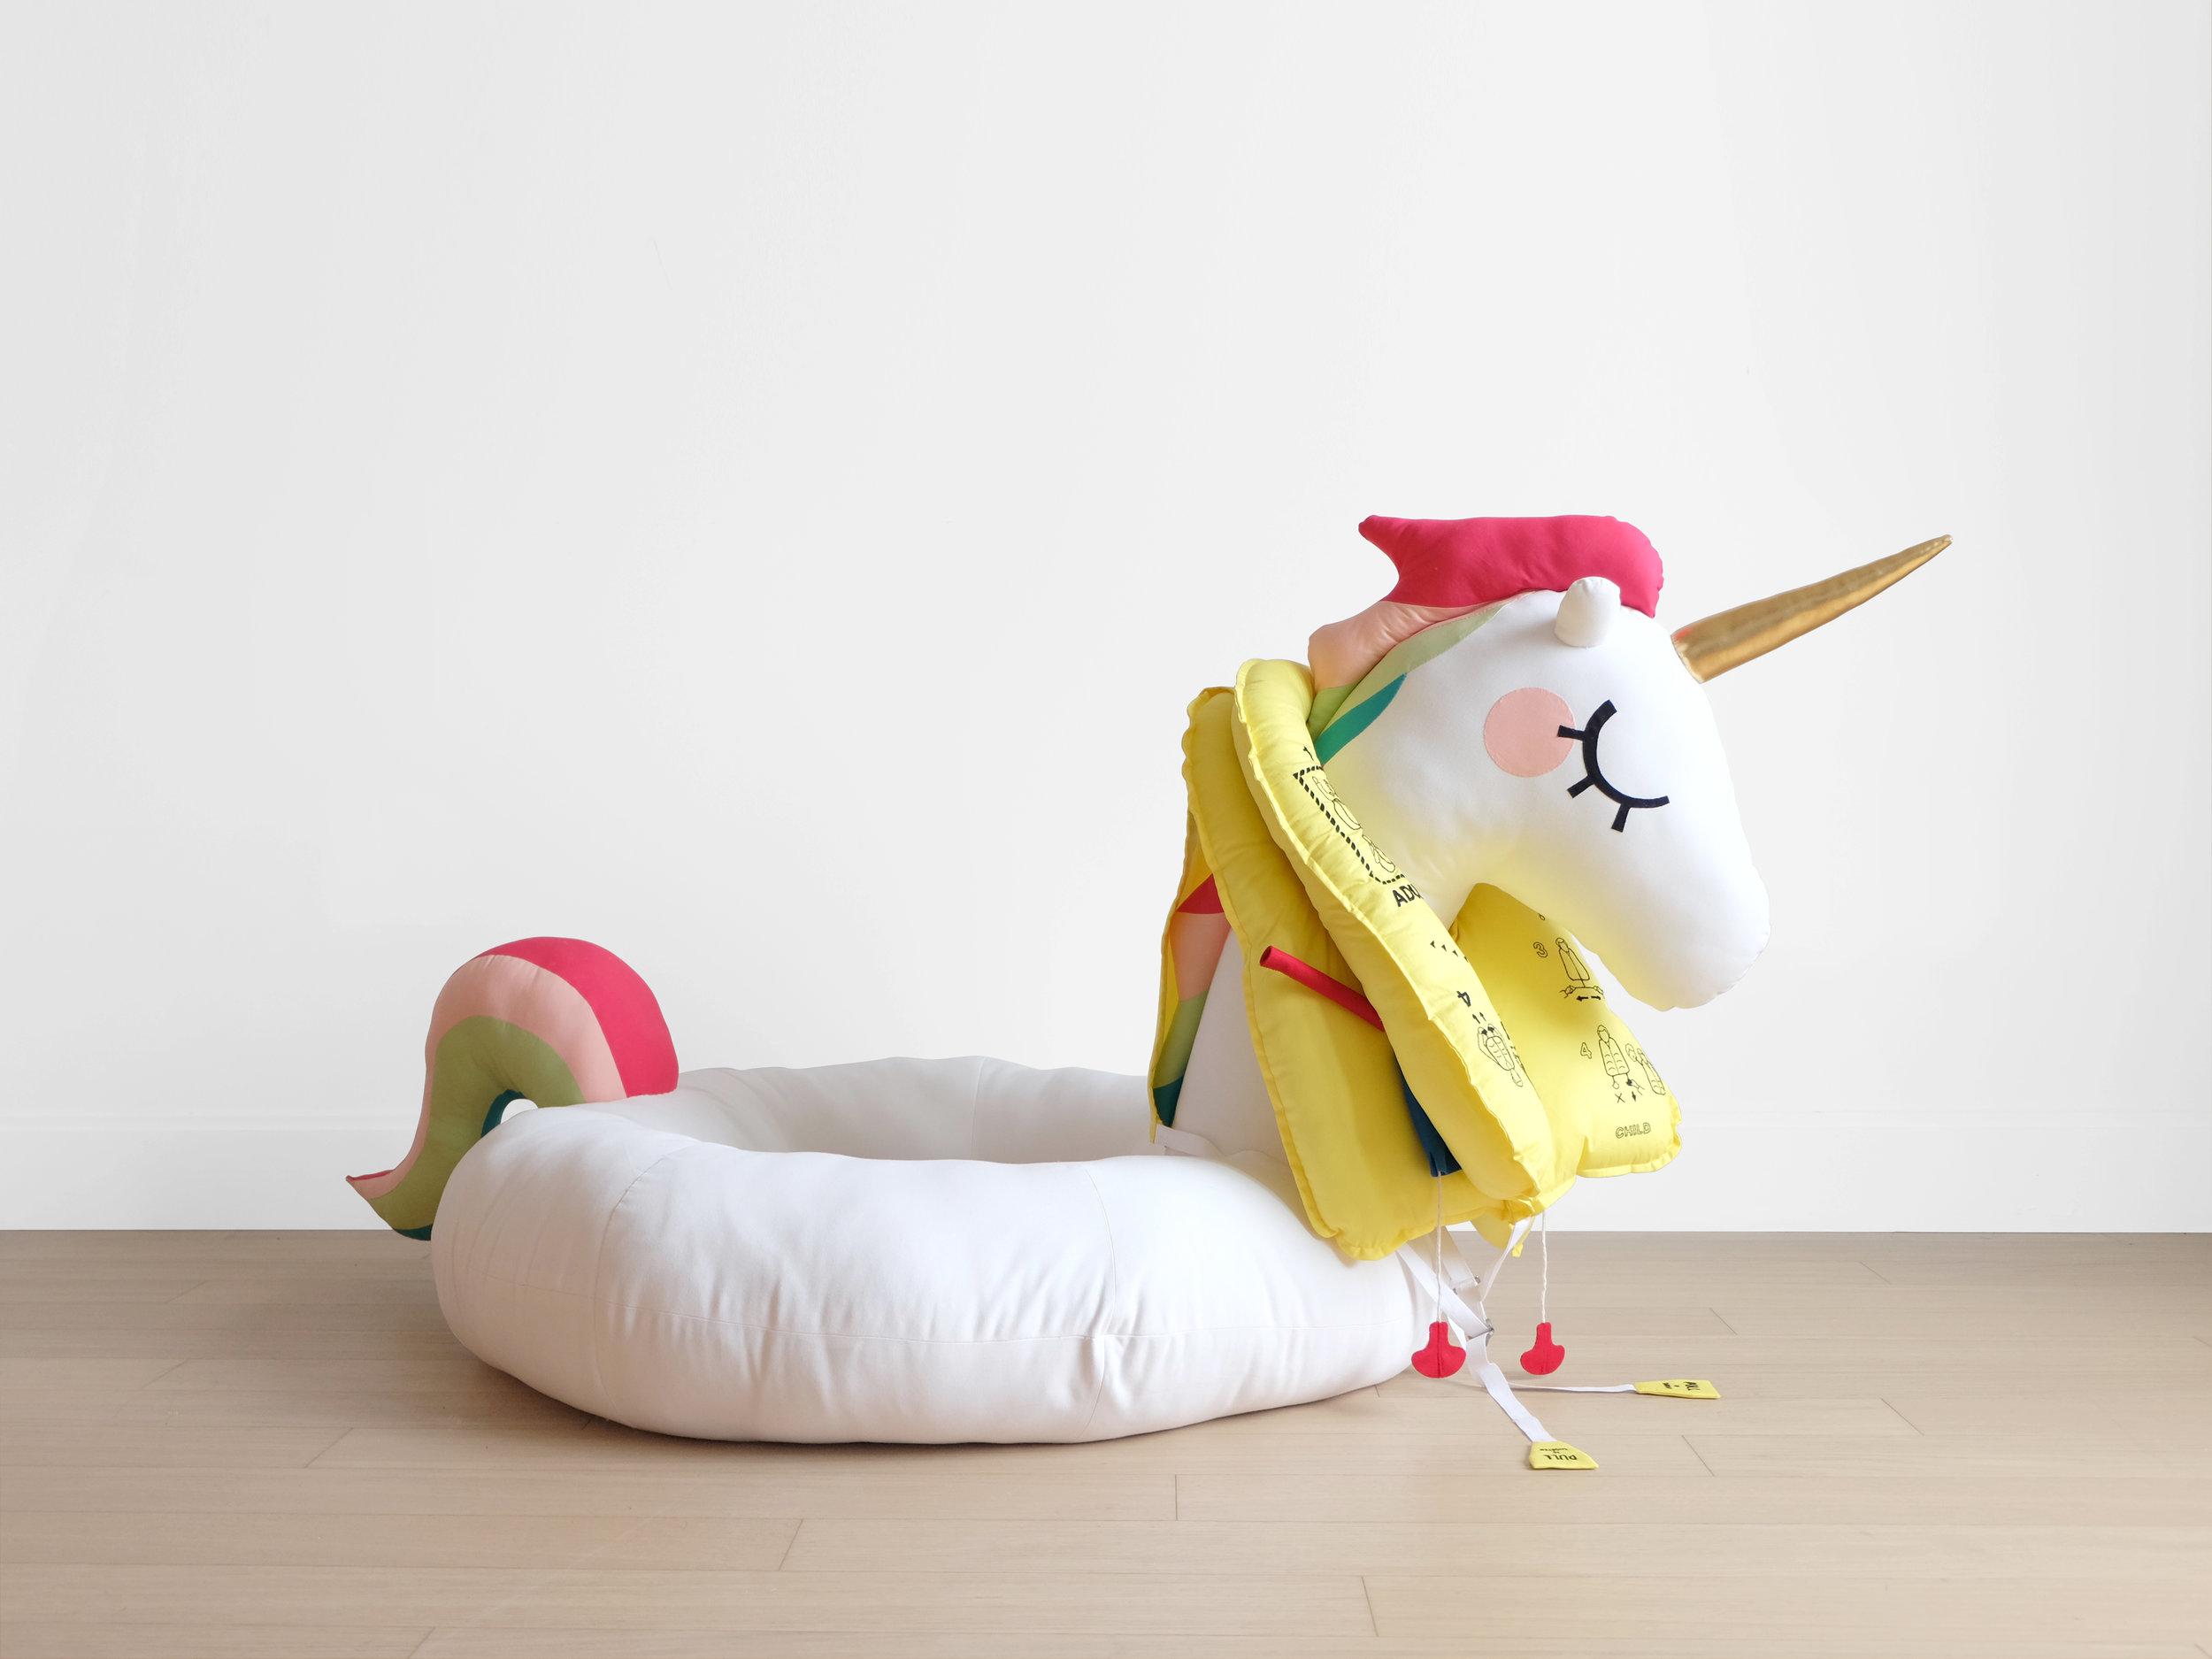 Mimi O Chun  Save the Unicorns!  Foam, batting, fiberfill, wood, felt, cotton cloth, elastane, embroidery floss, webbing, rope, metal belt parts Approximately 60 x 42 x 43 in 2018